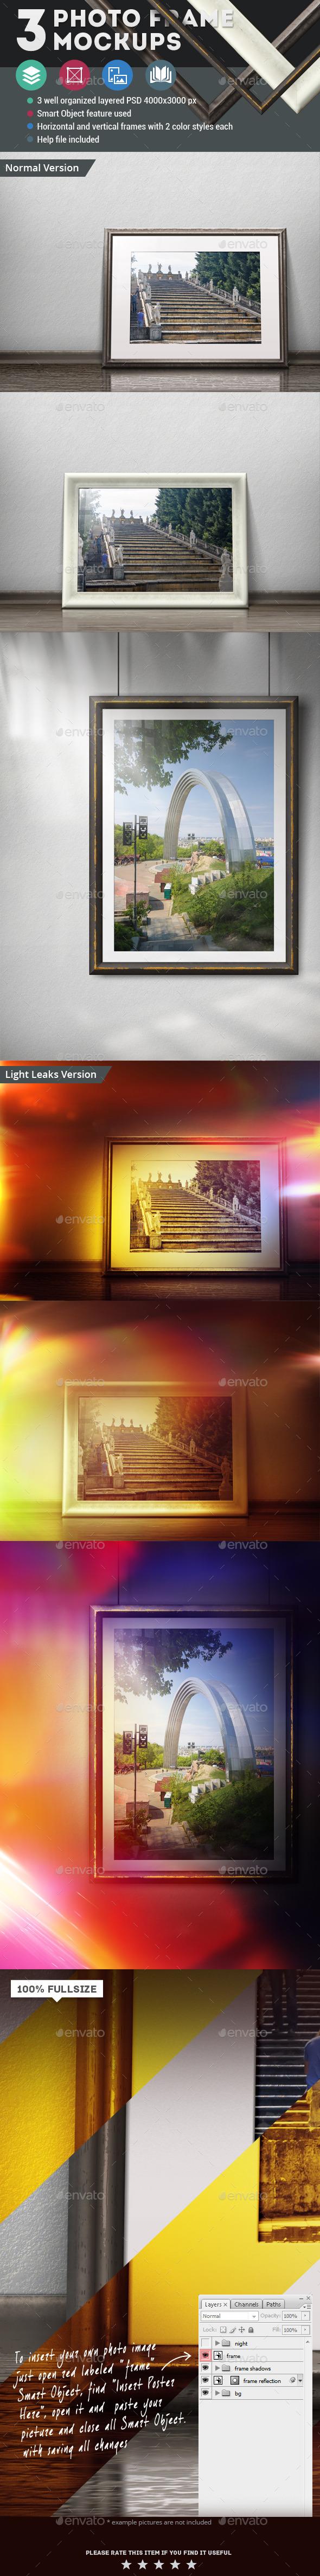 3 Photo Frame Mockups - Posters Print